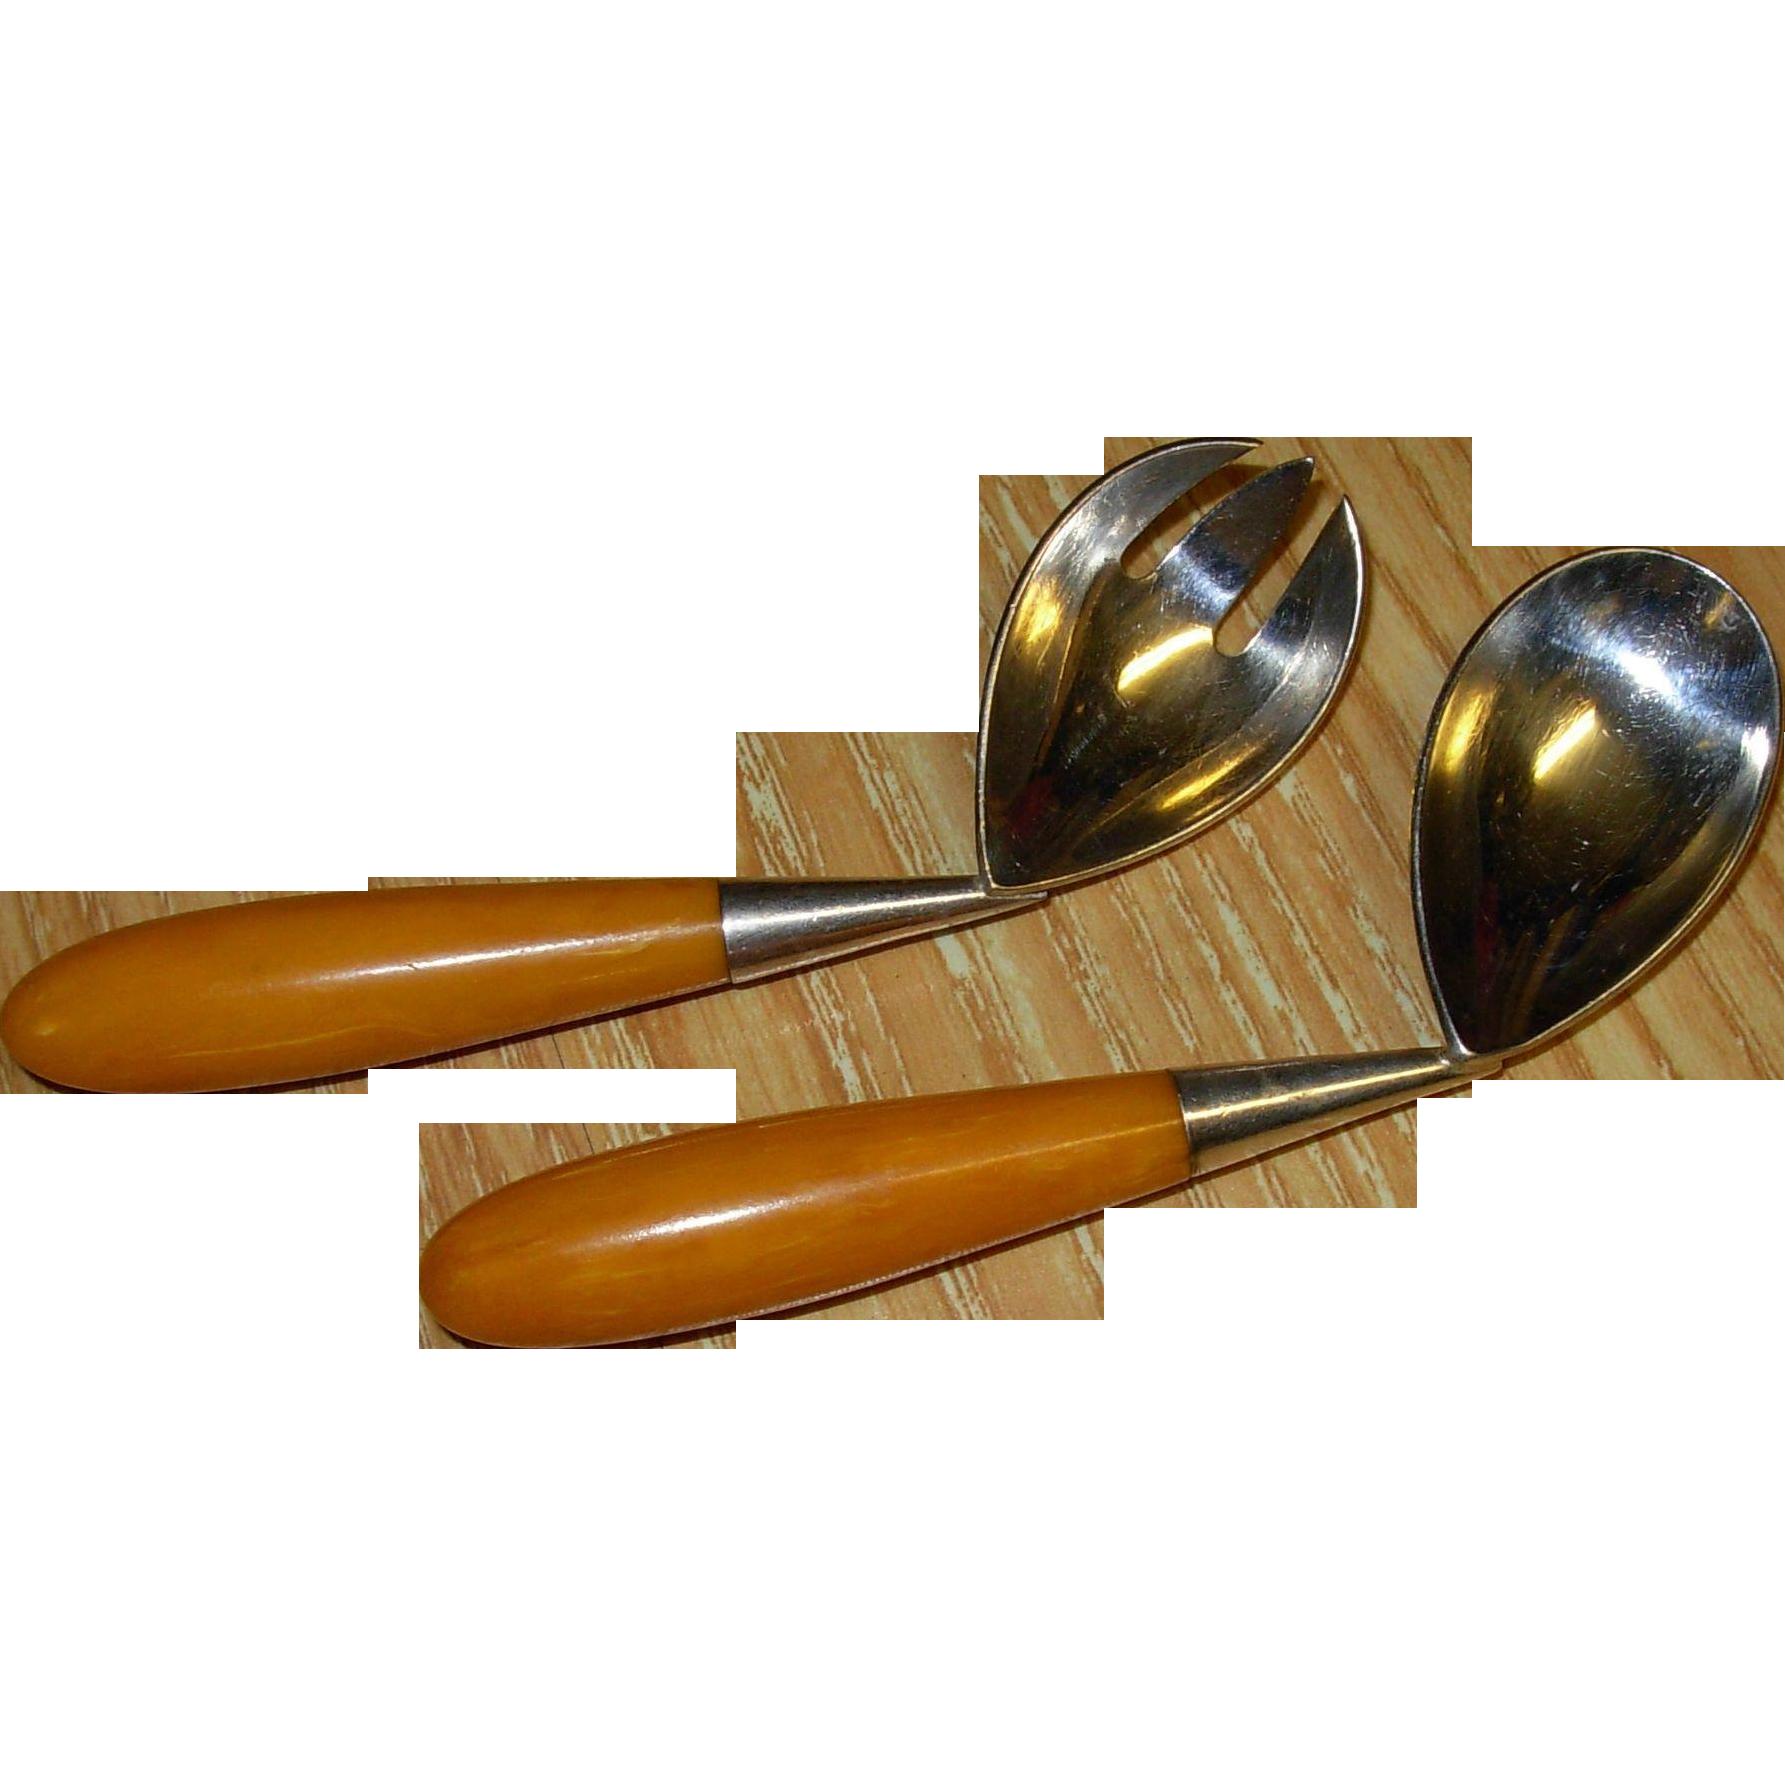 Vintage Bakelite Handle Napier Baby Spoon and Fork Set